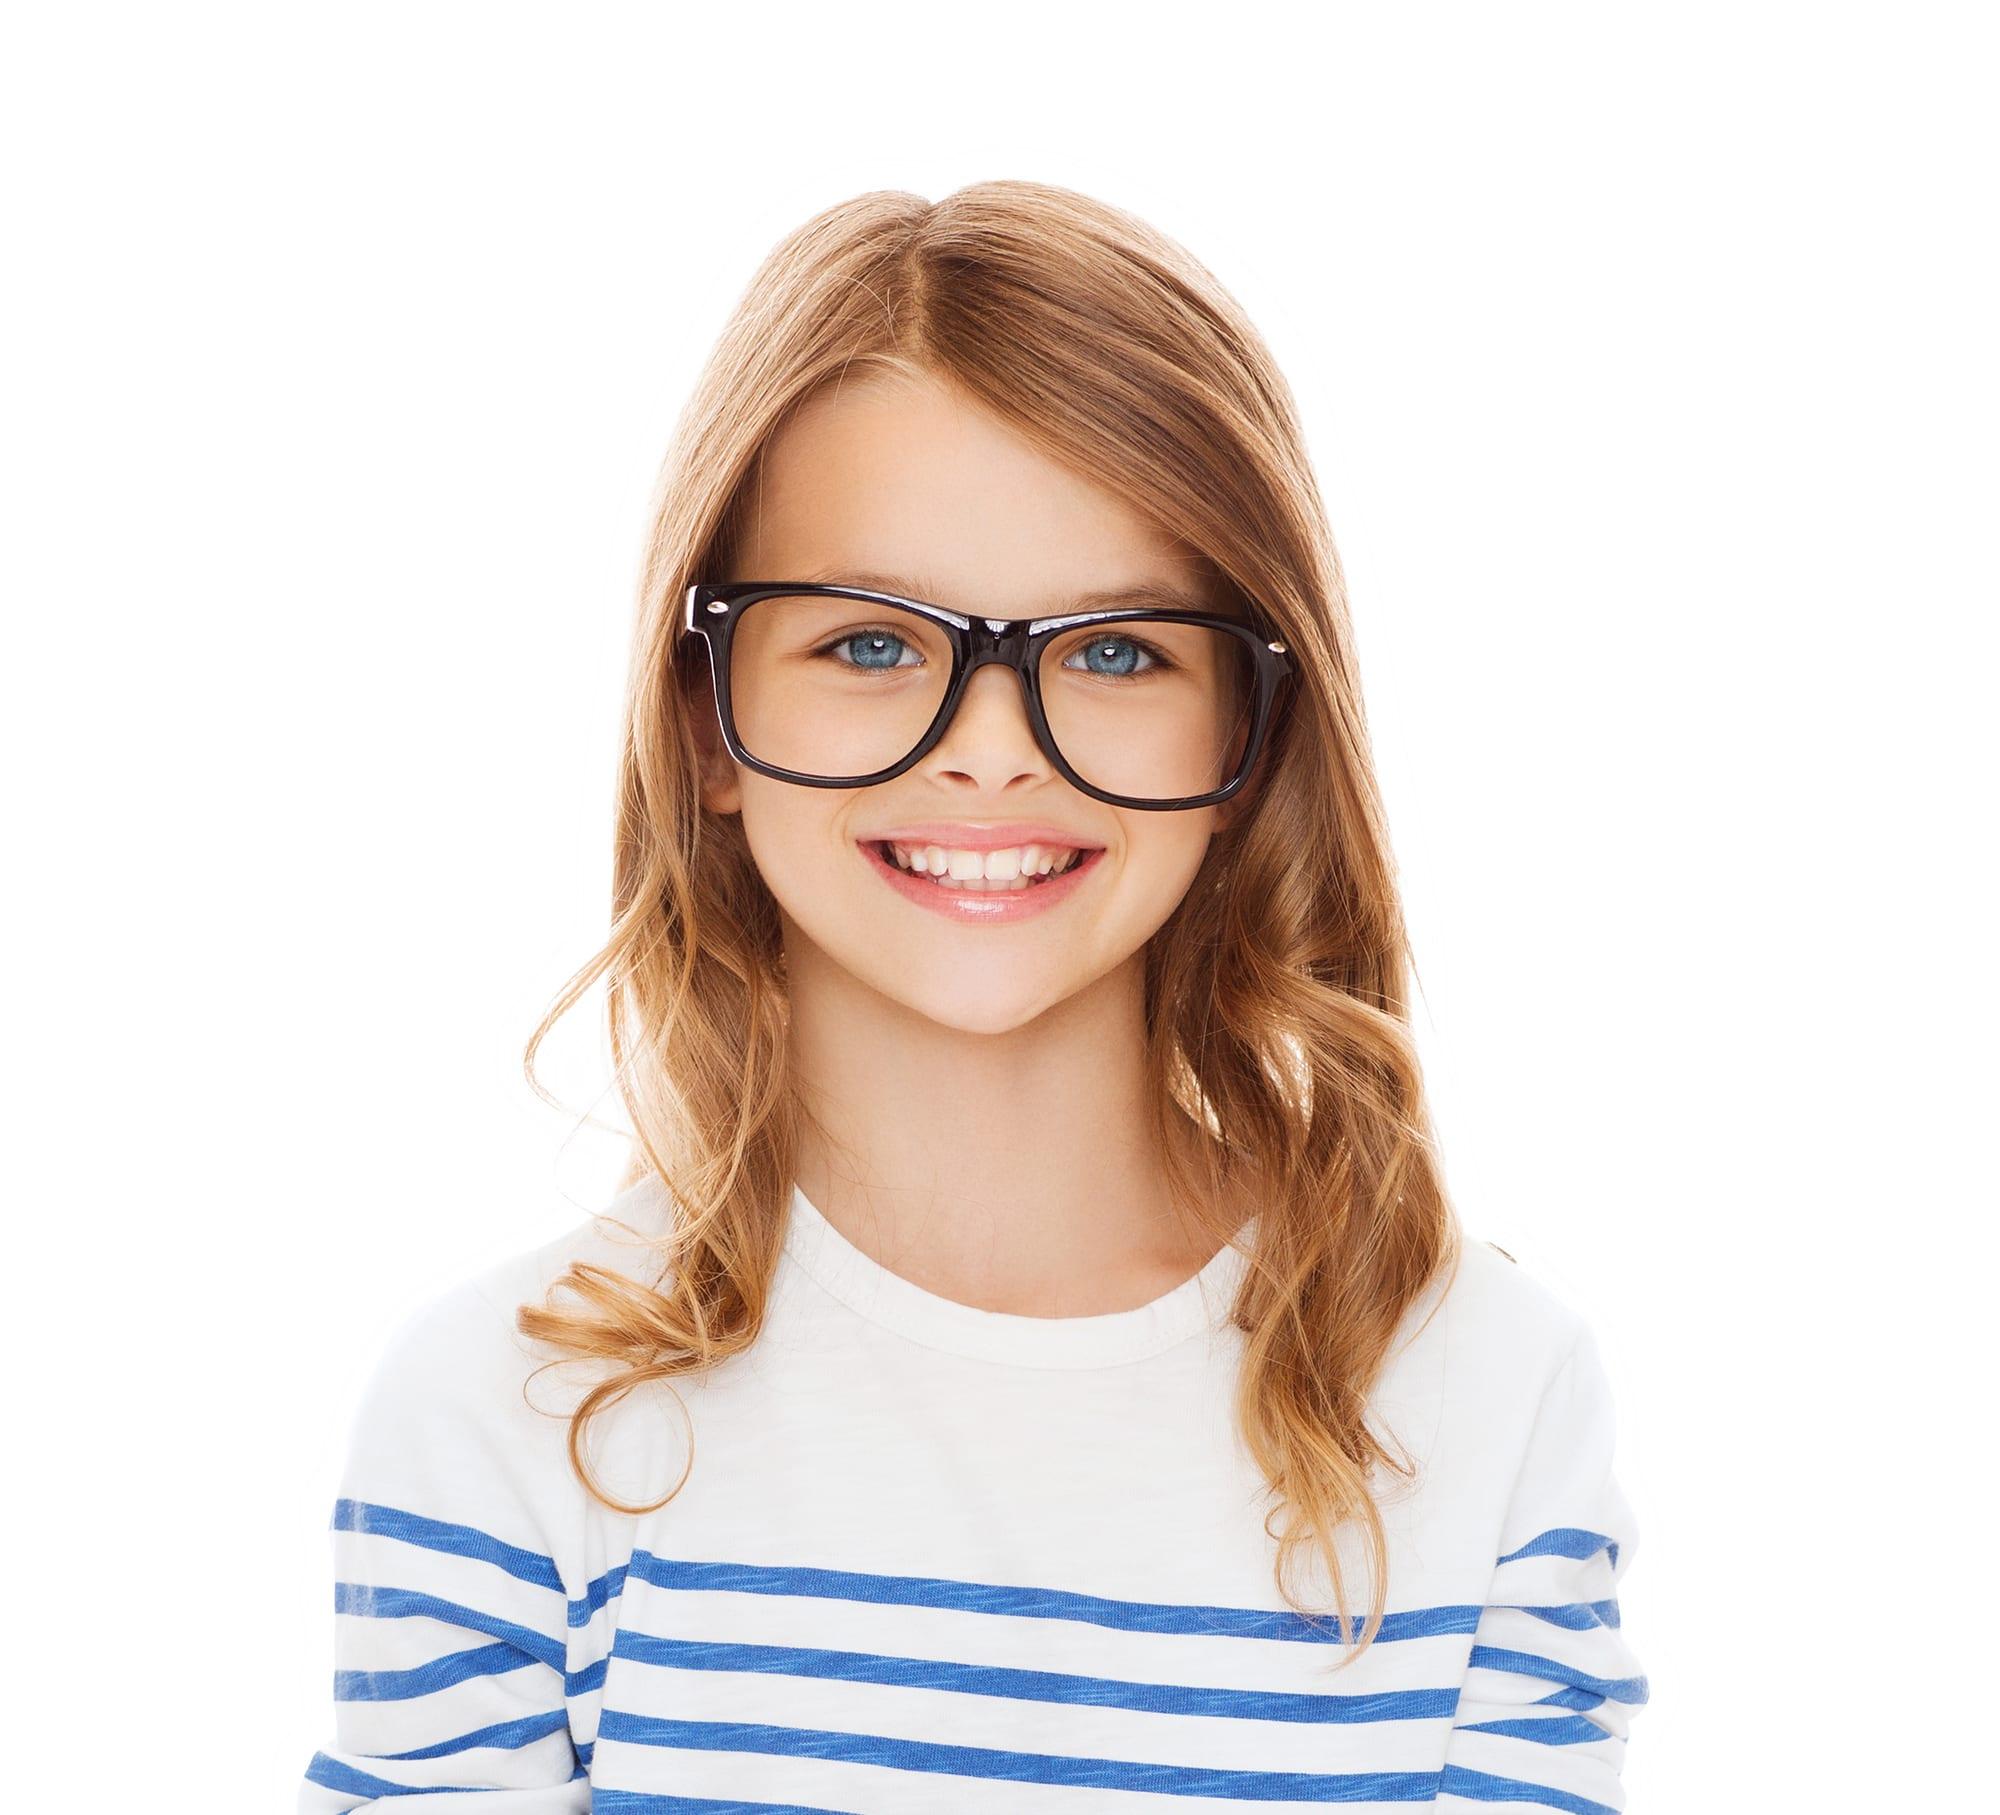 8 Ways to raise smarter kids #positiveparenting #parentingtips #parentingstrategies #howtoraisesmarterkids #howtomakeyourkidssmarter